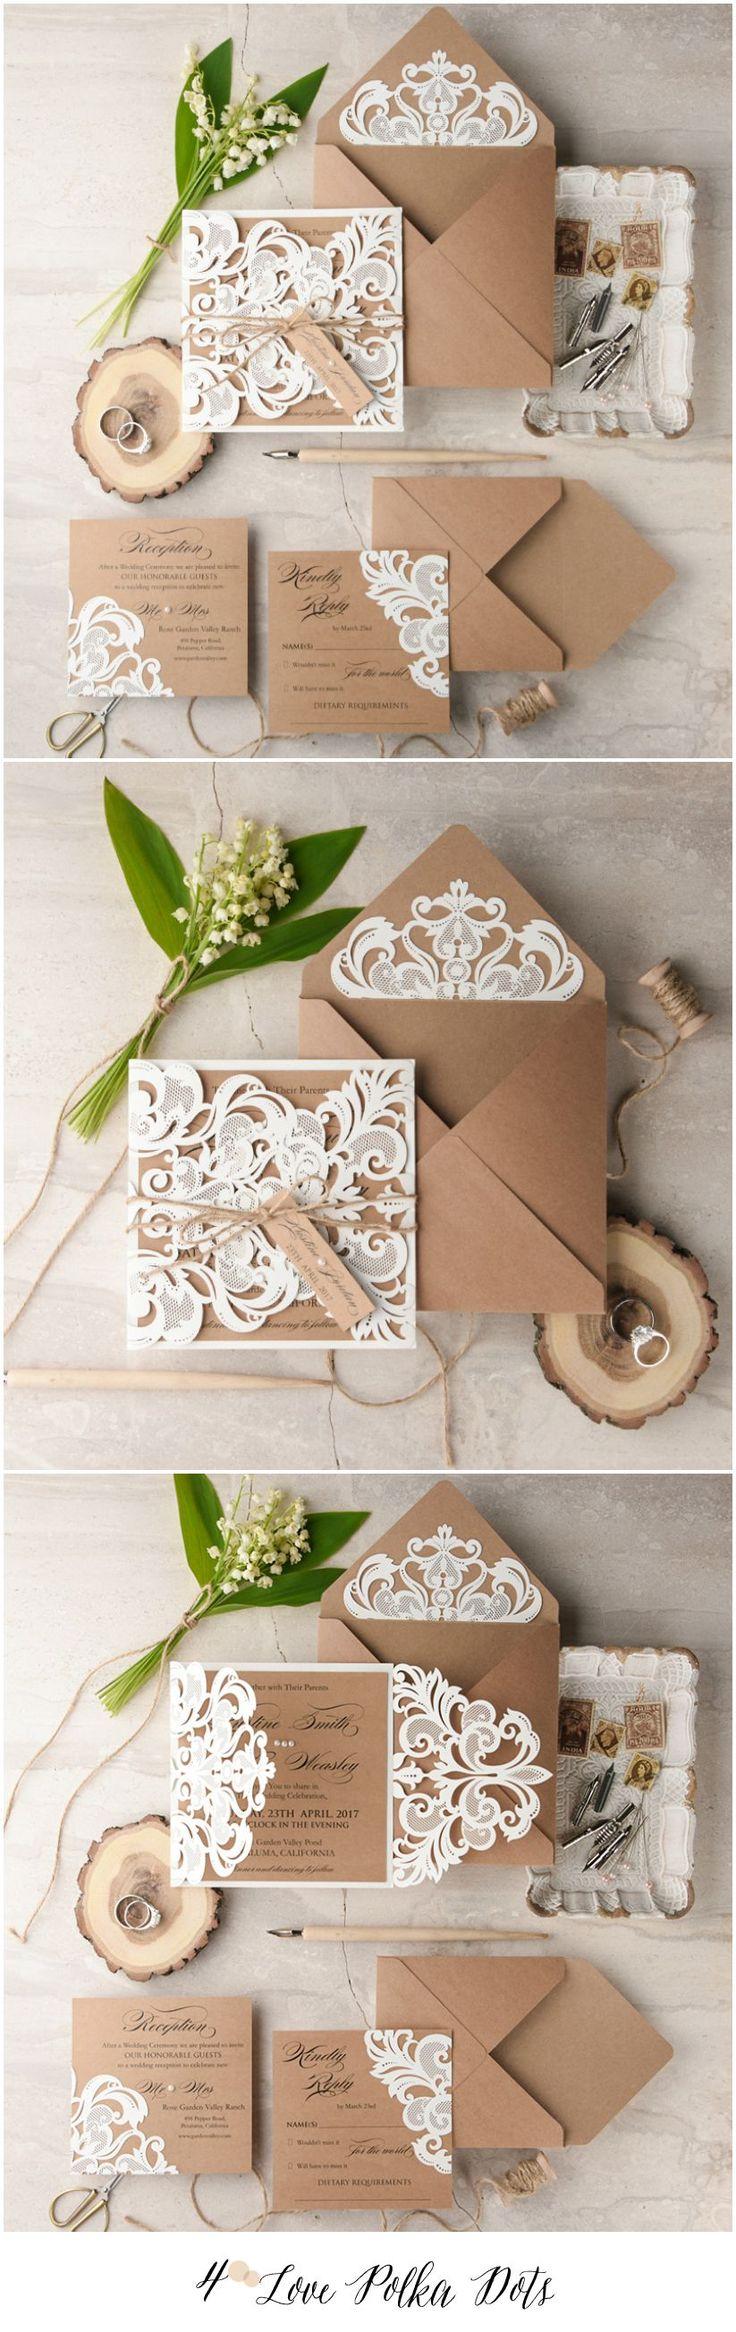 Best 25+ Romantic wedding invitations ideas on Pinterest | Wedding ...